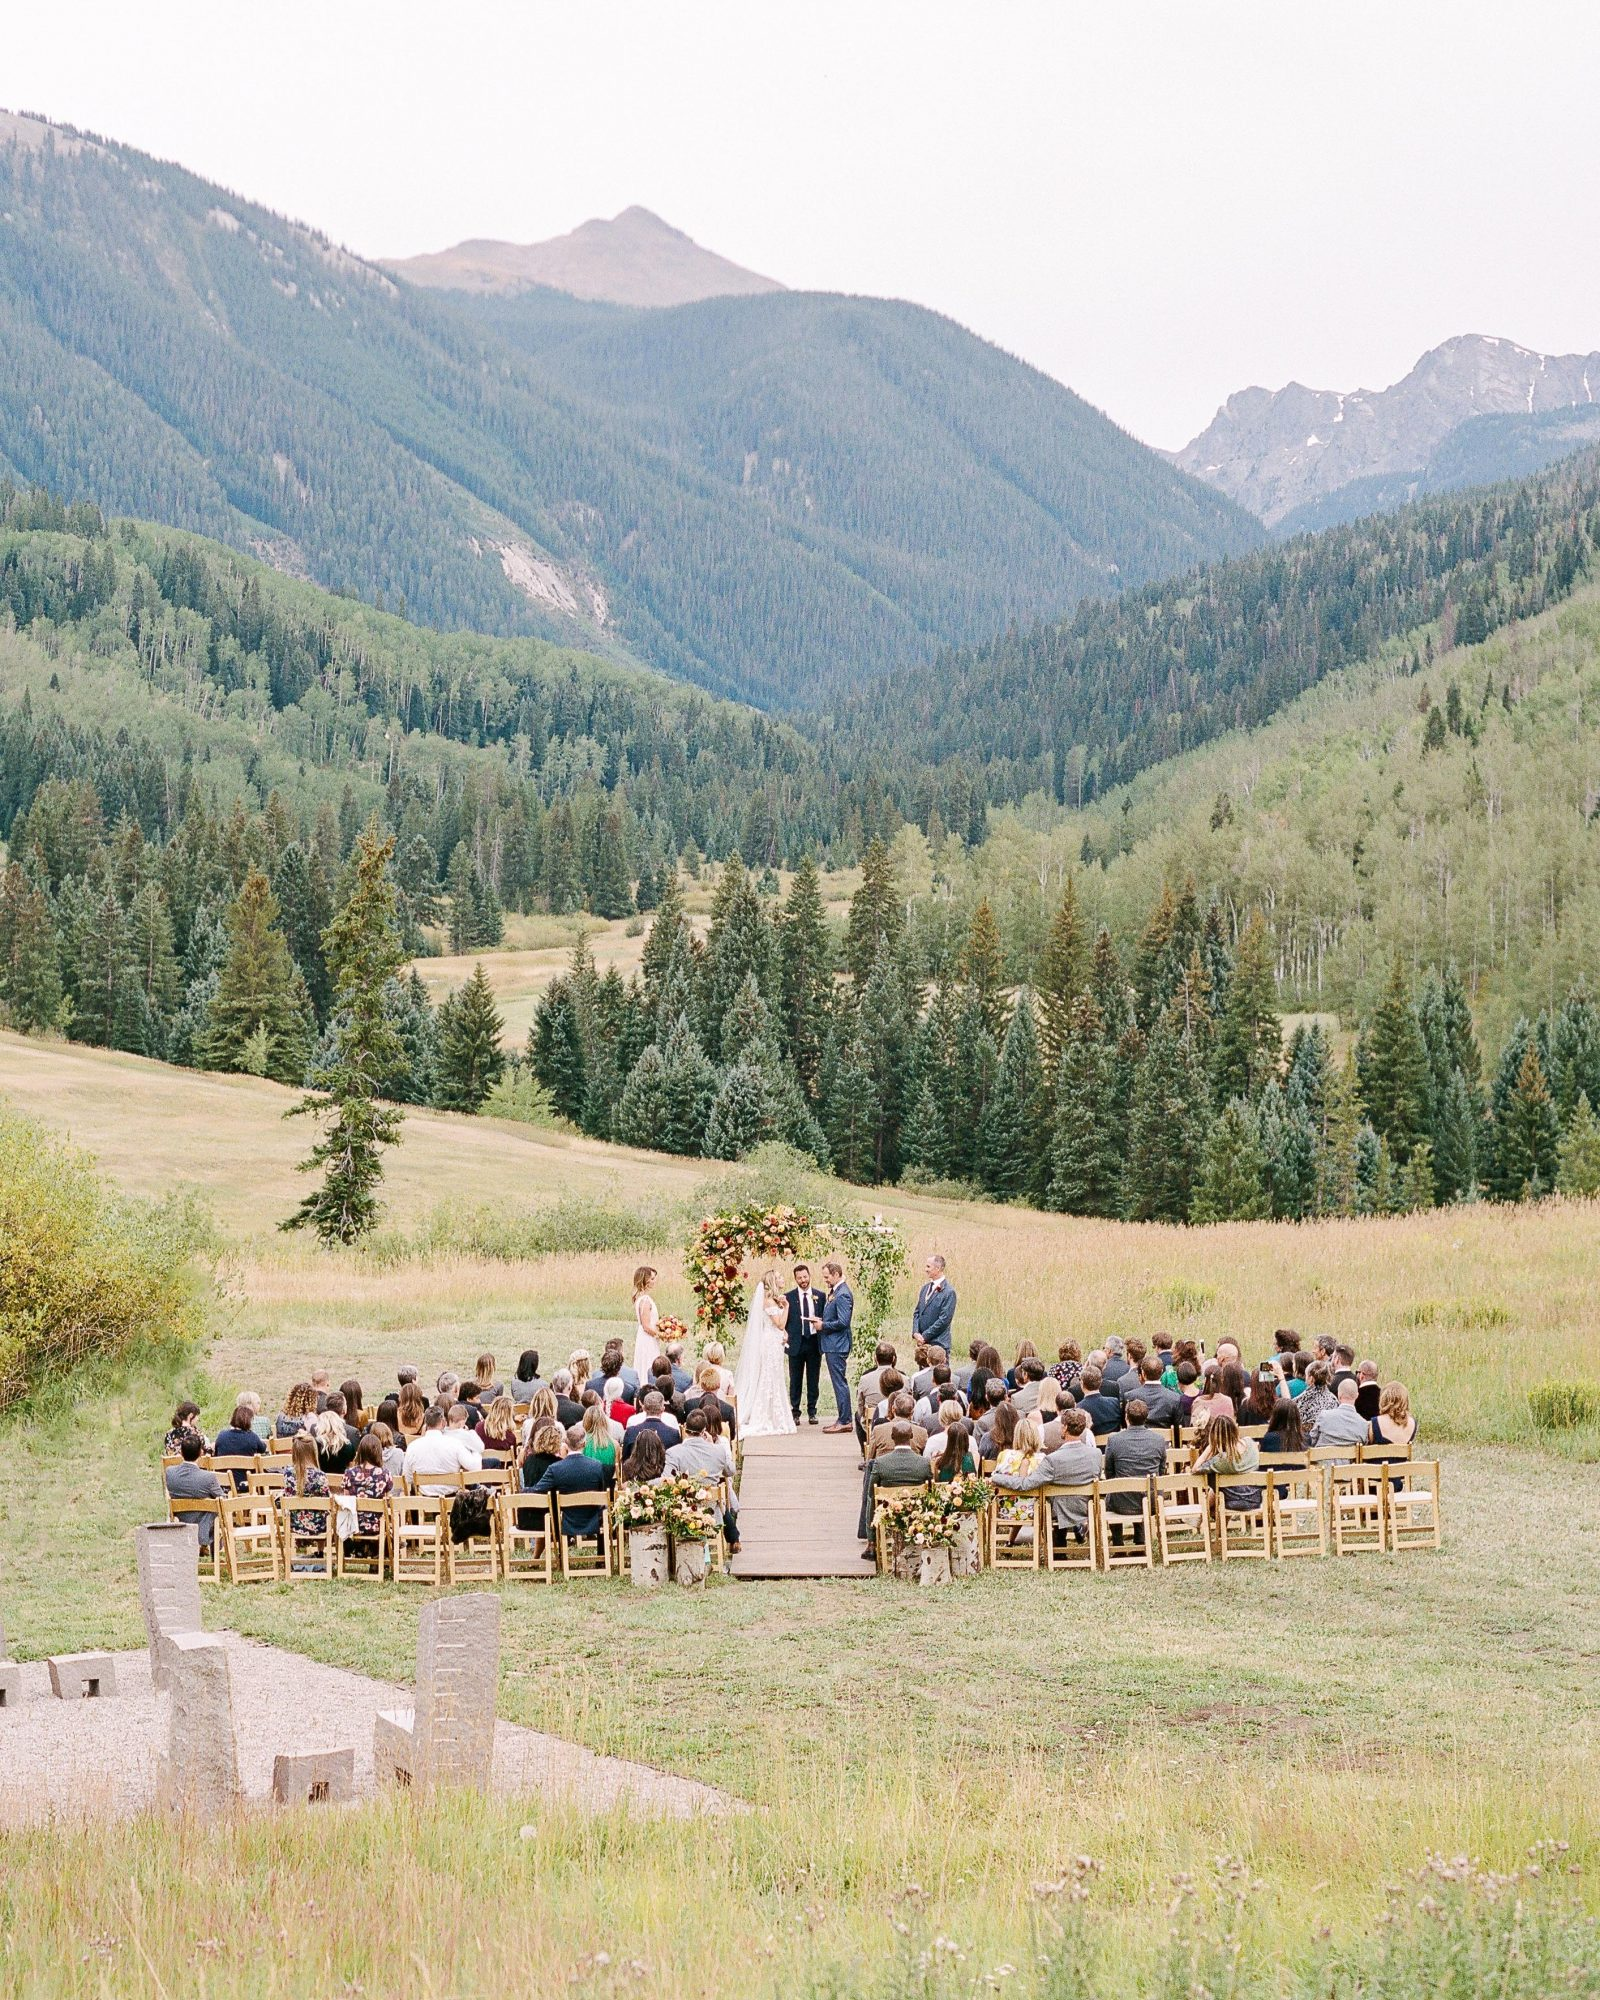 jill phil wedding ceremony mountainous outdoor venue